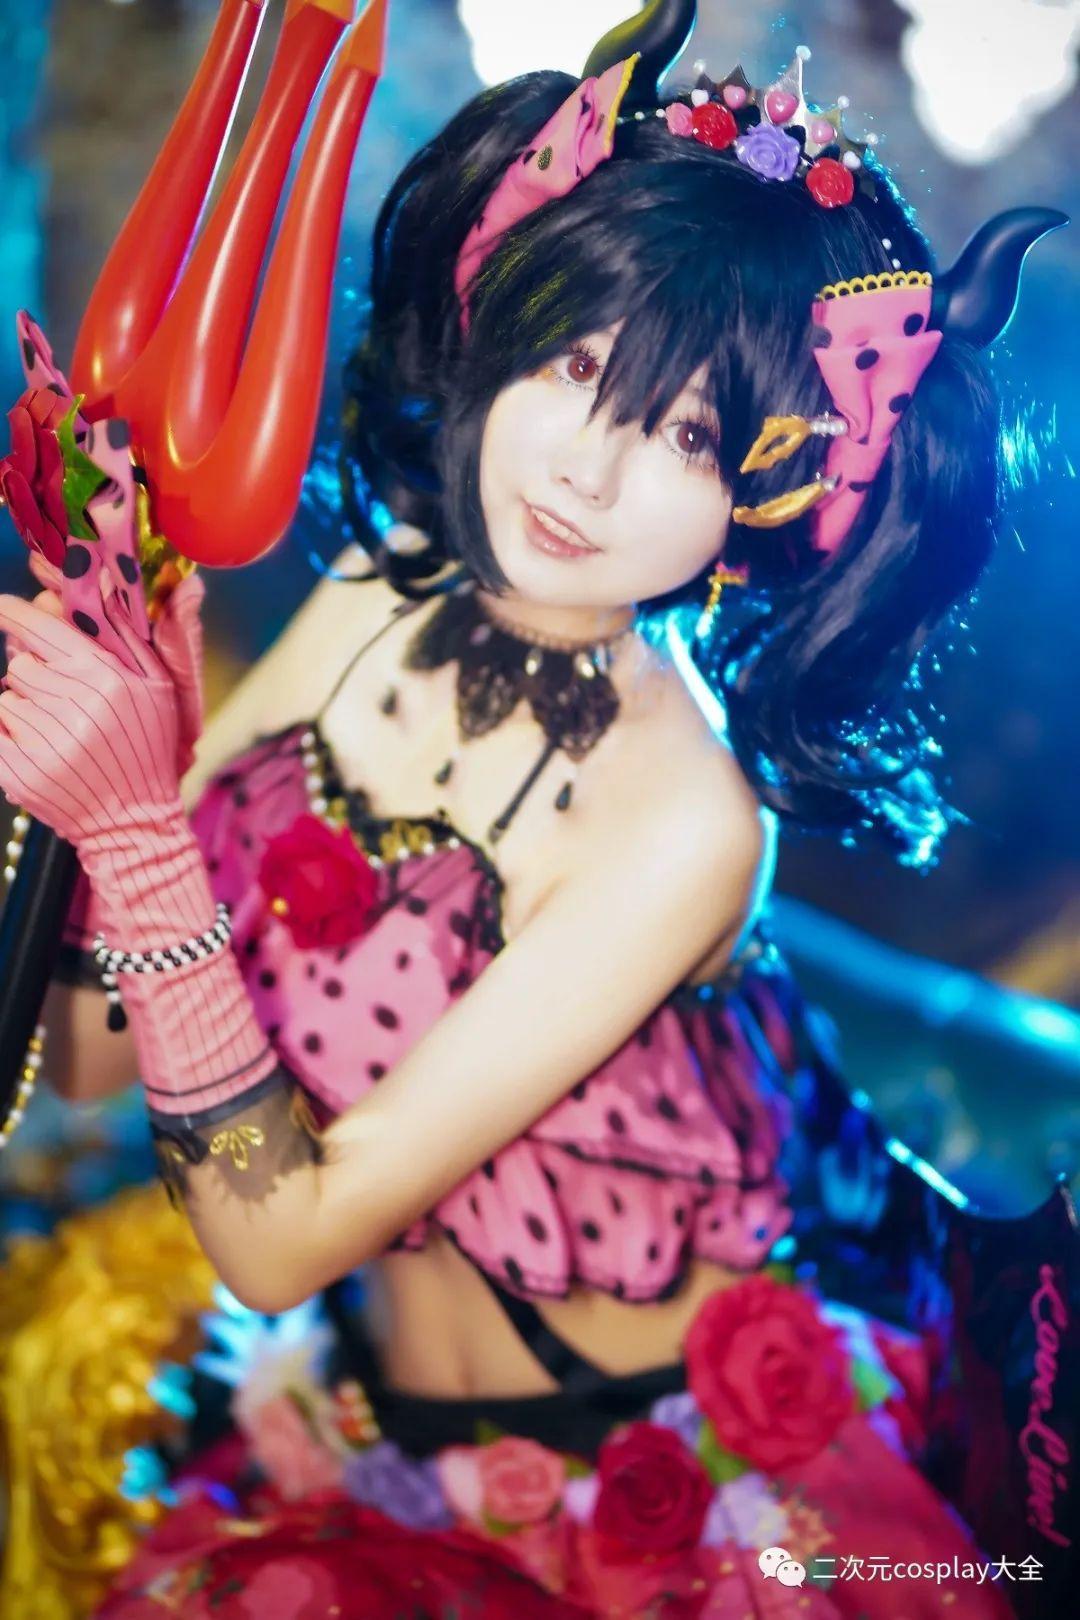 cosplay – 《lovelive!》小恶魔觉醒矢泽妮可,第一秒以为是可爱,然而被网格黑丝所吸引 - [leimu486.com] No.4